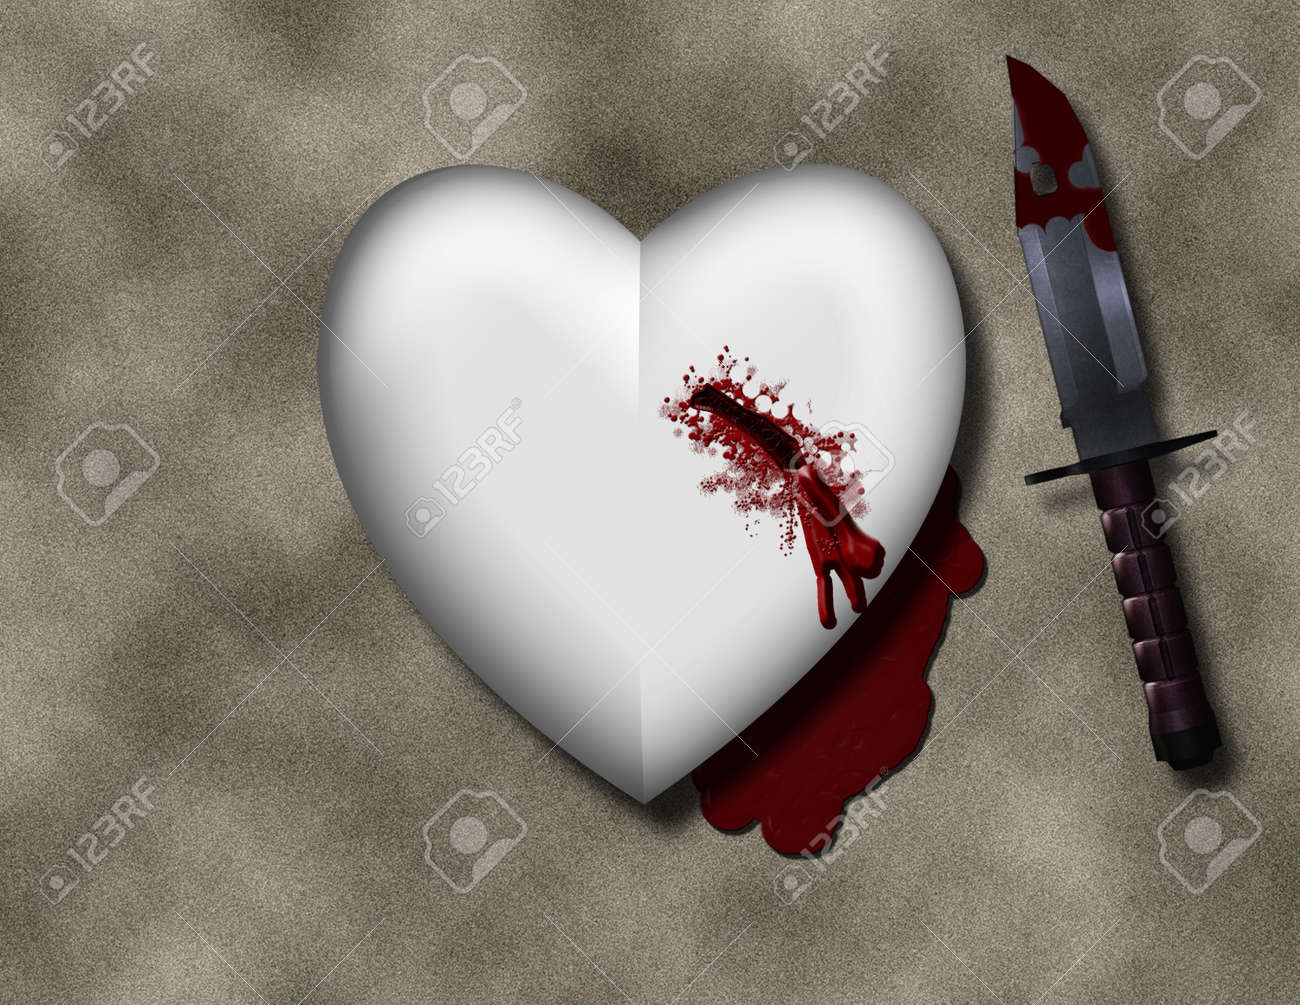 Bleeding heart with bloody knife stock photo picture and royalty bleeding heart with bloody knife stock photo 10498333 buycottarizona